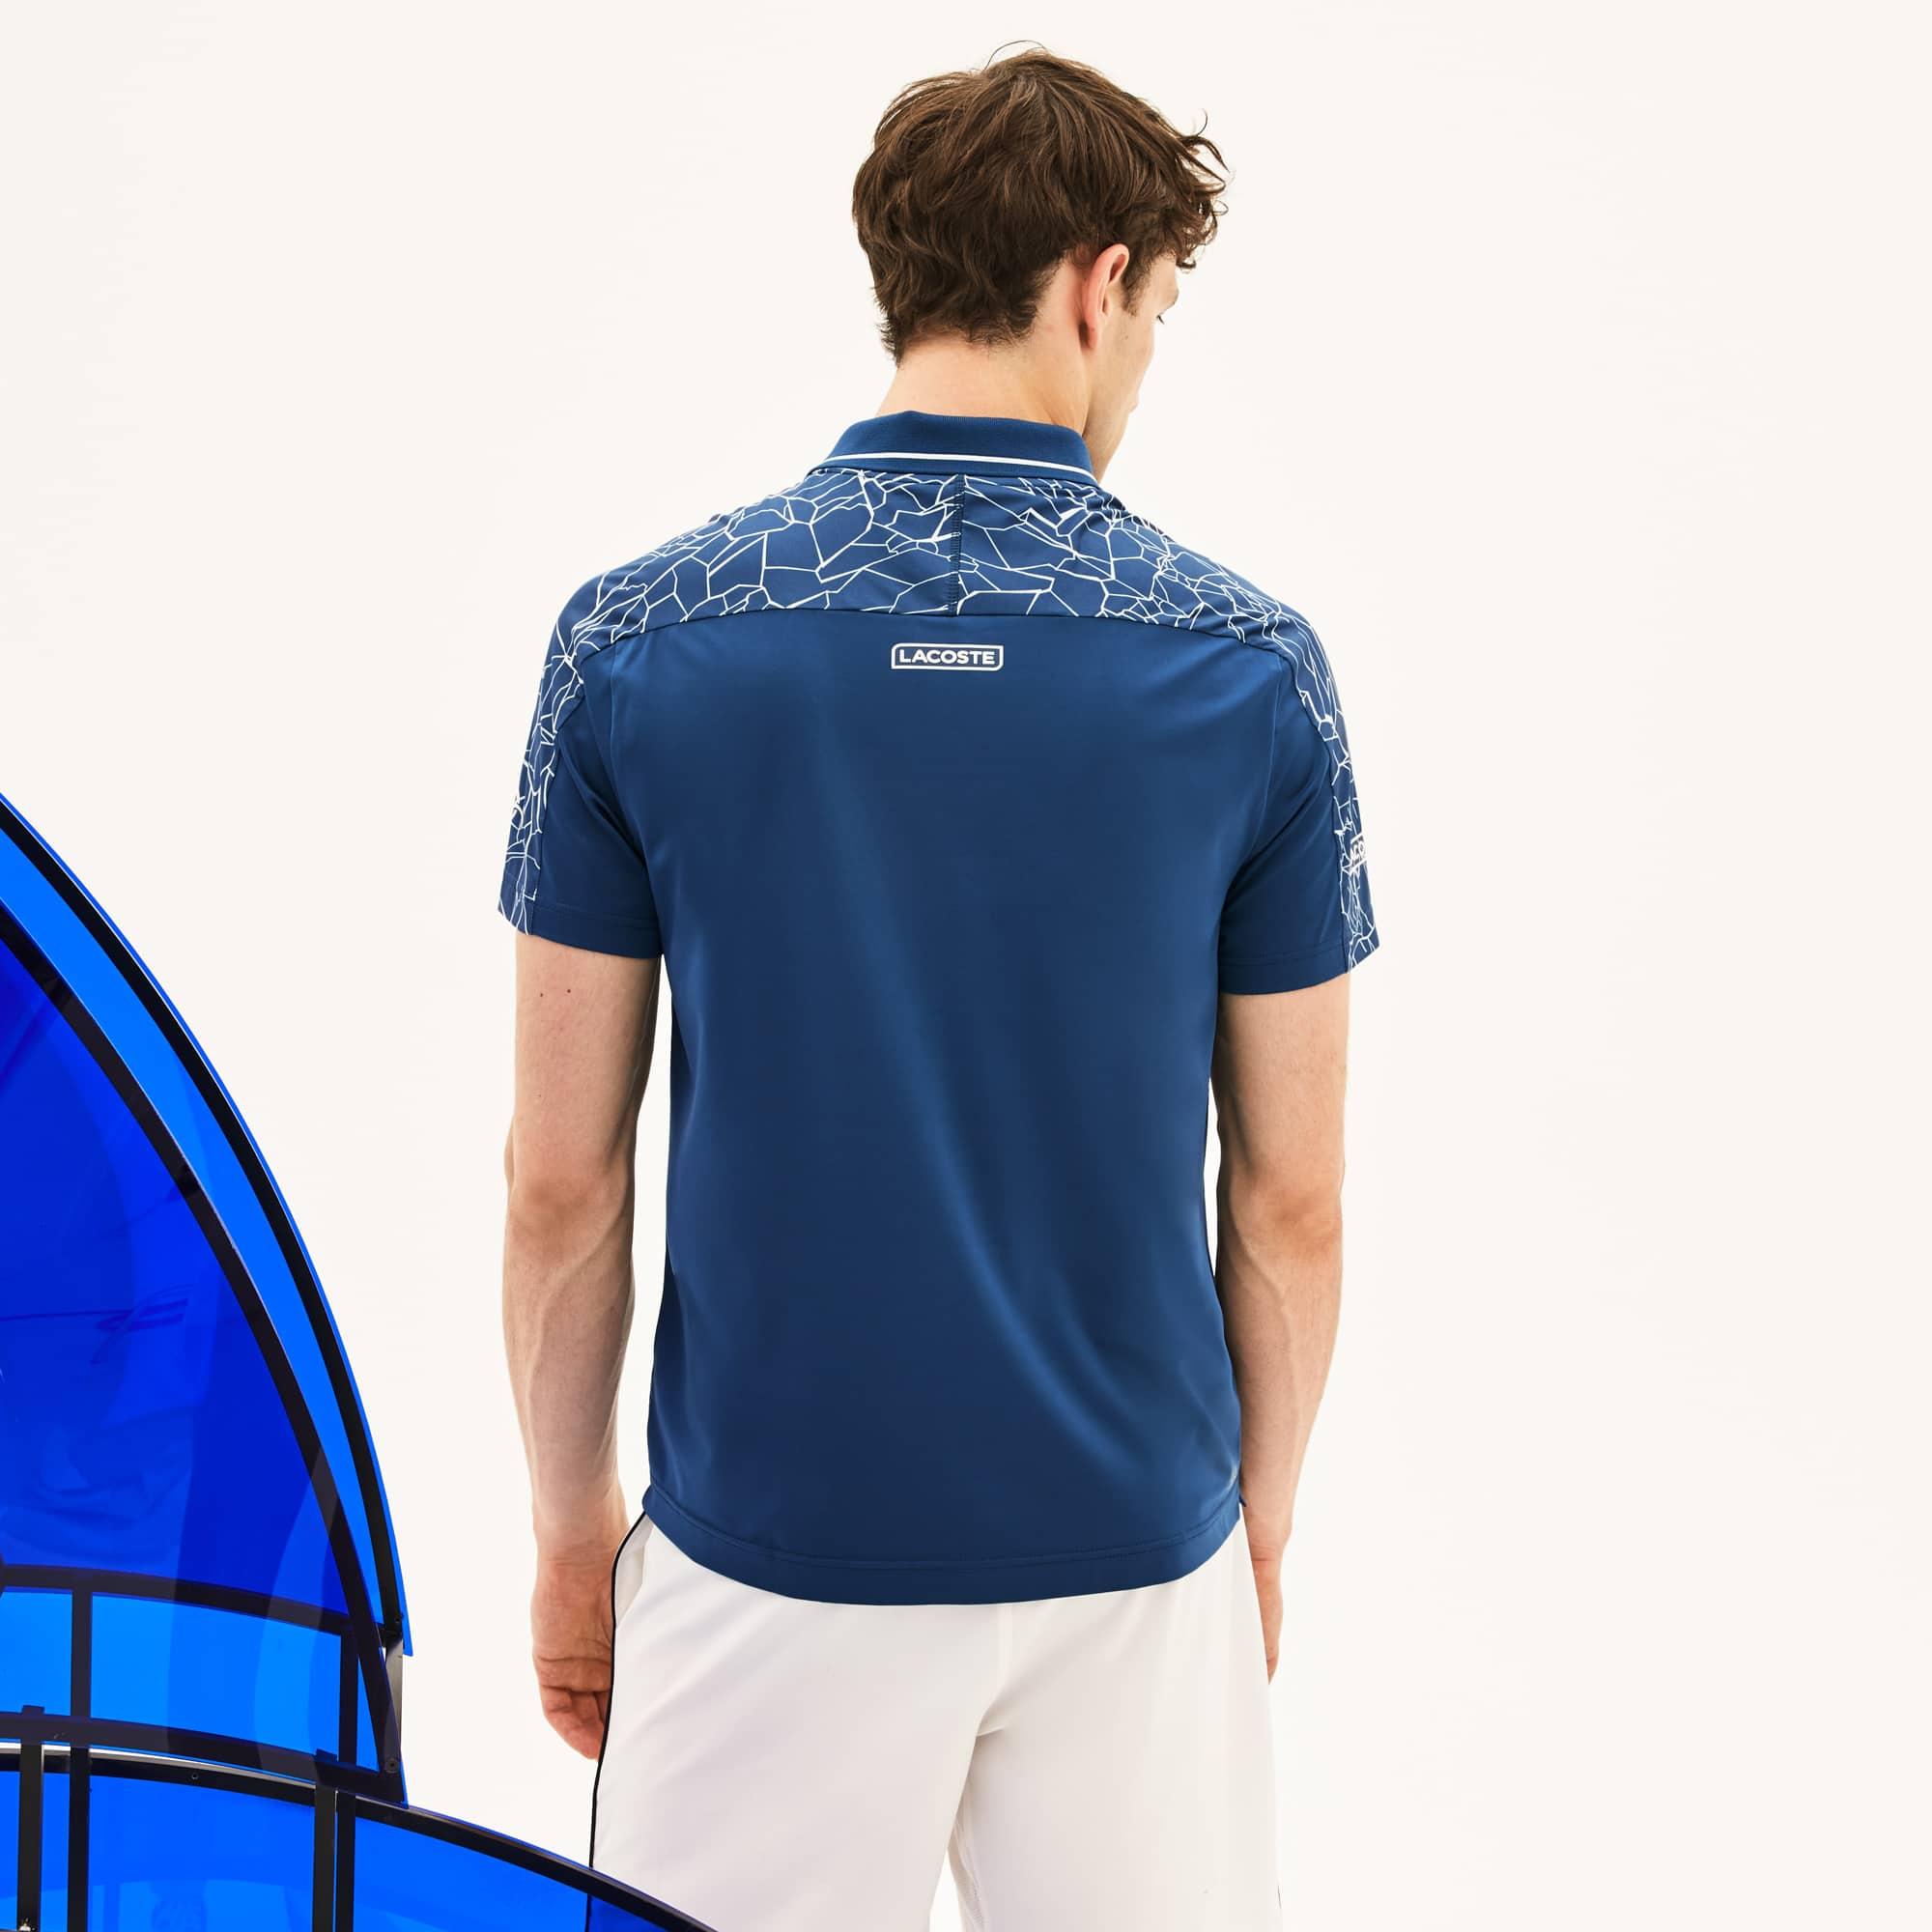 Lacoste - Herren-Poloshirt aus Stretch-Jersey LACOSTE SPORT NOVAK DJOKOVIC - 2